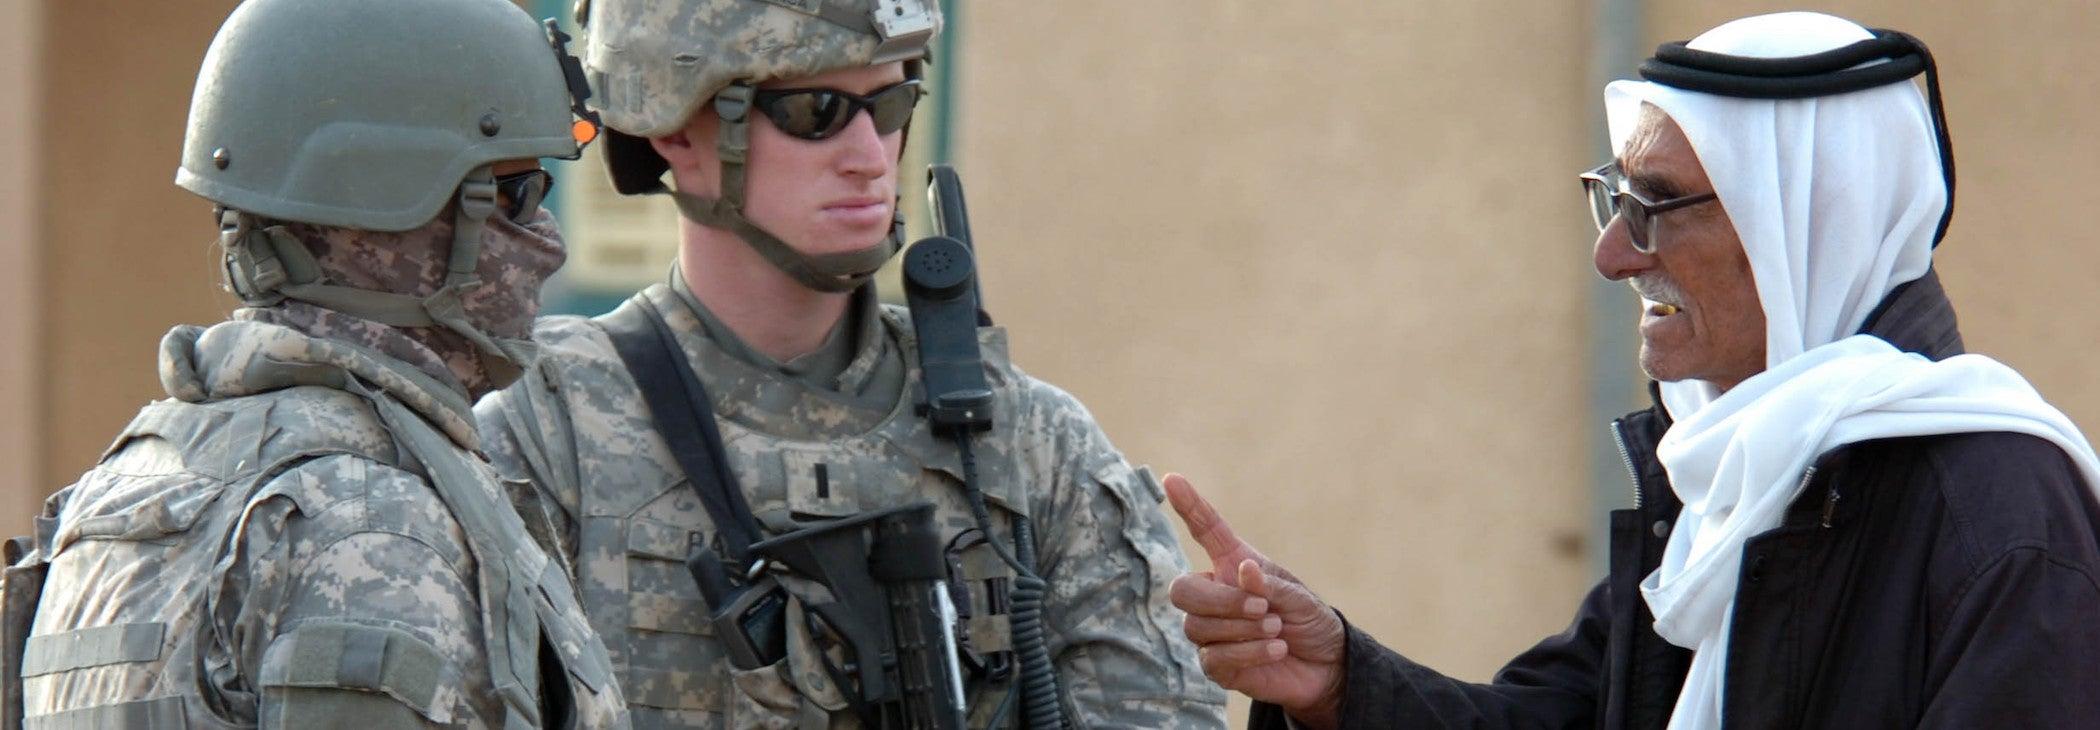 Iraqi Translator Becomes U.S. Airman